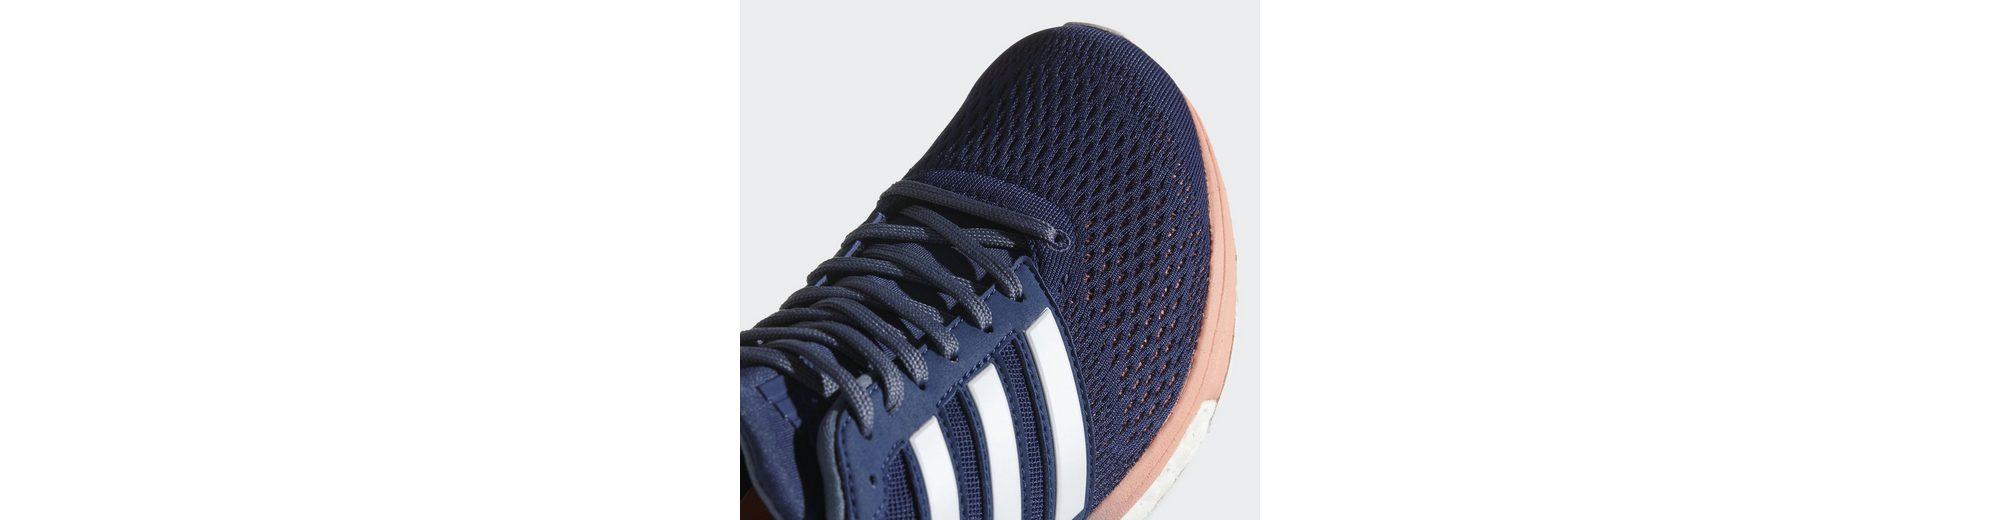 6 Laufschuh adidas Performance Performance adidas Schuh adizero adizero Boston wpFqgYxSTY